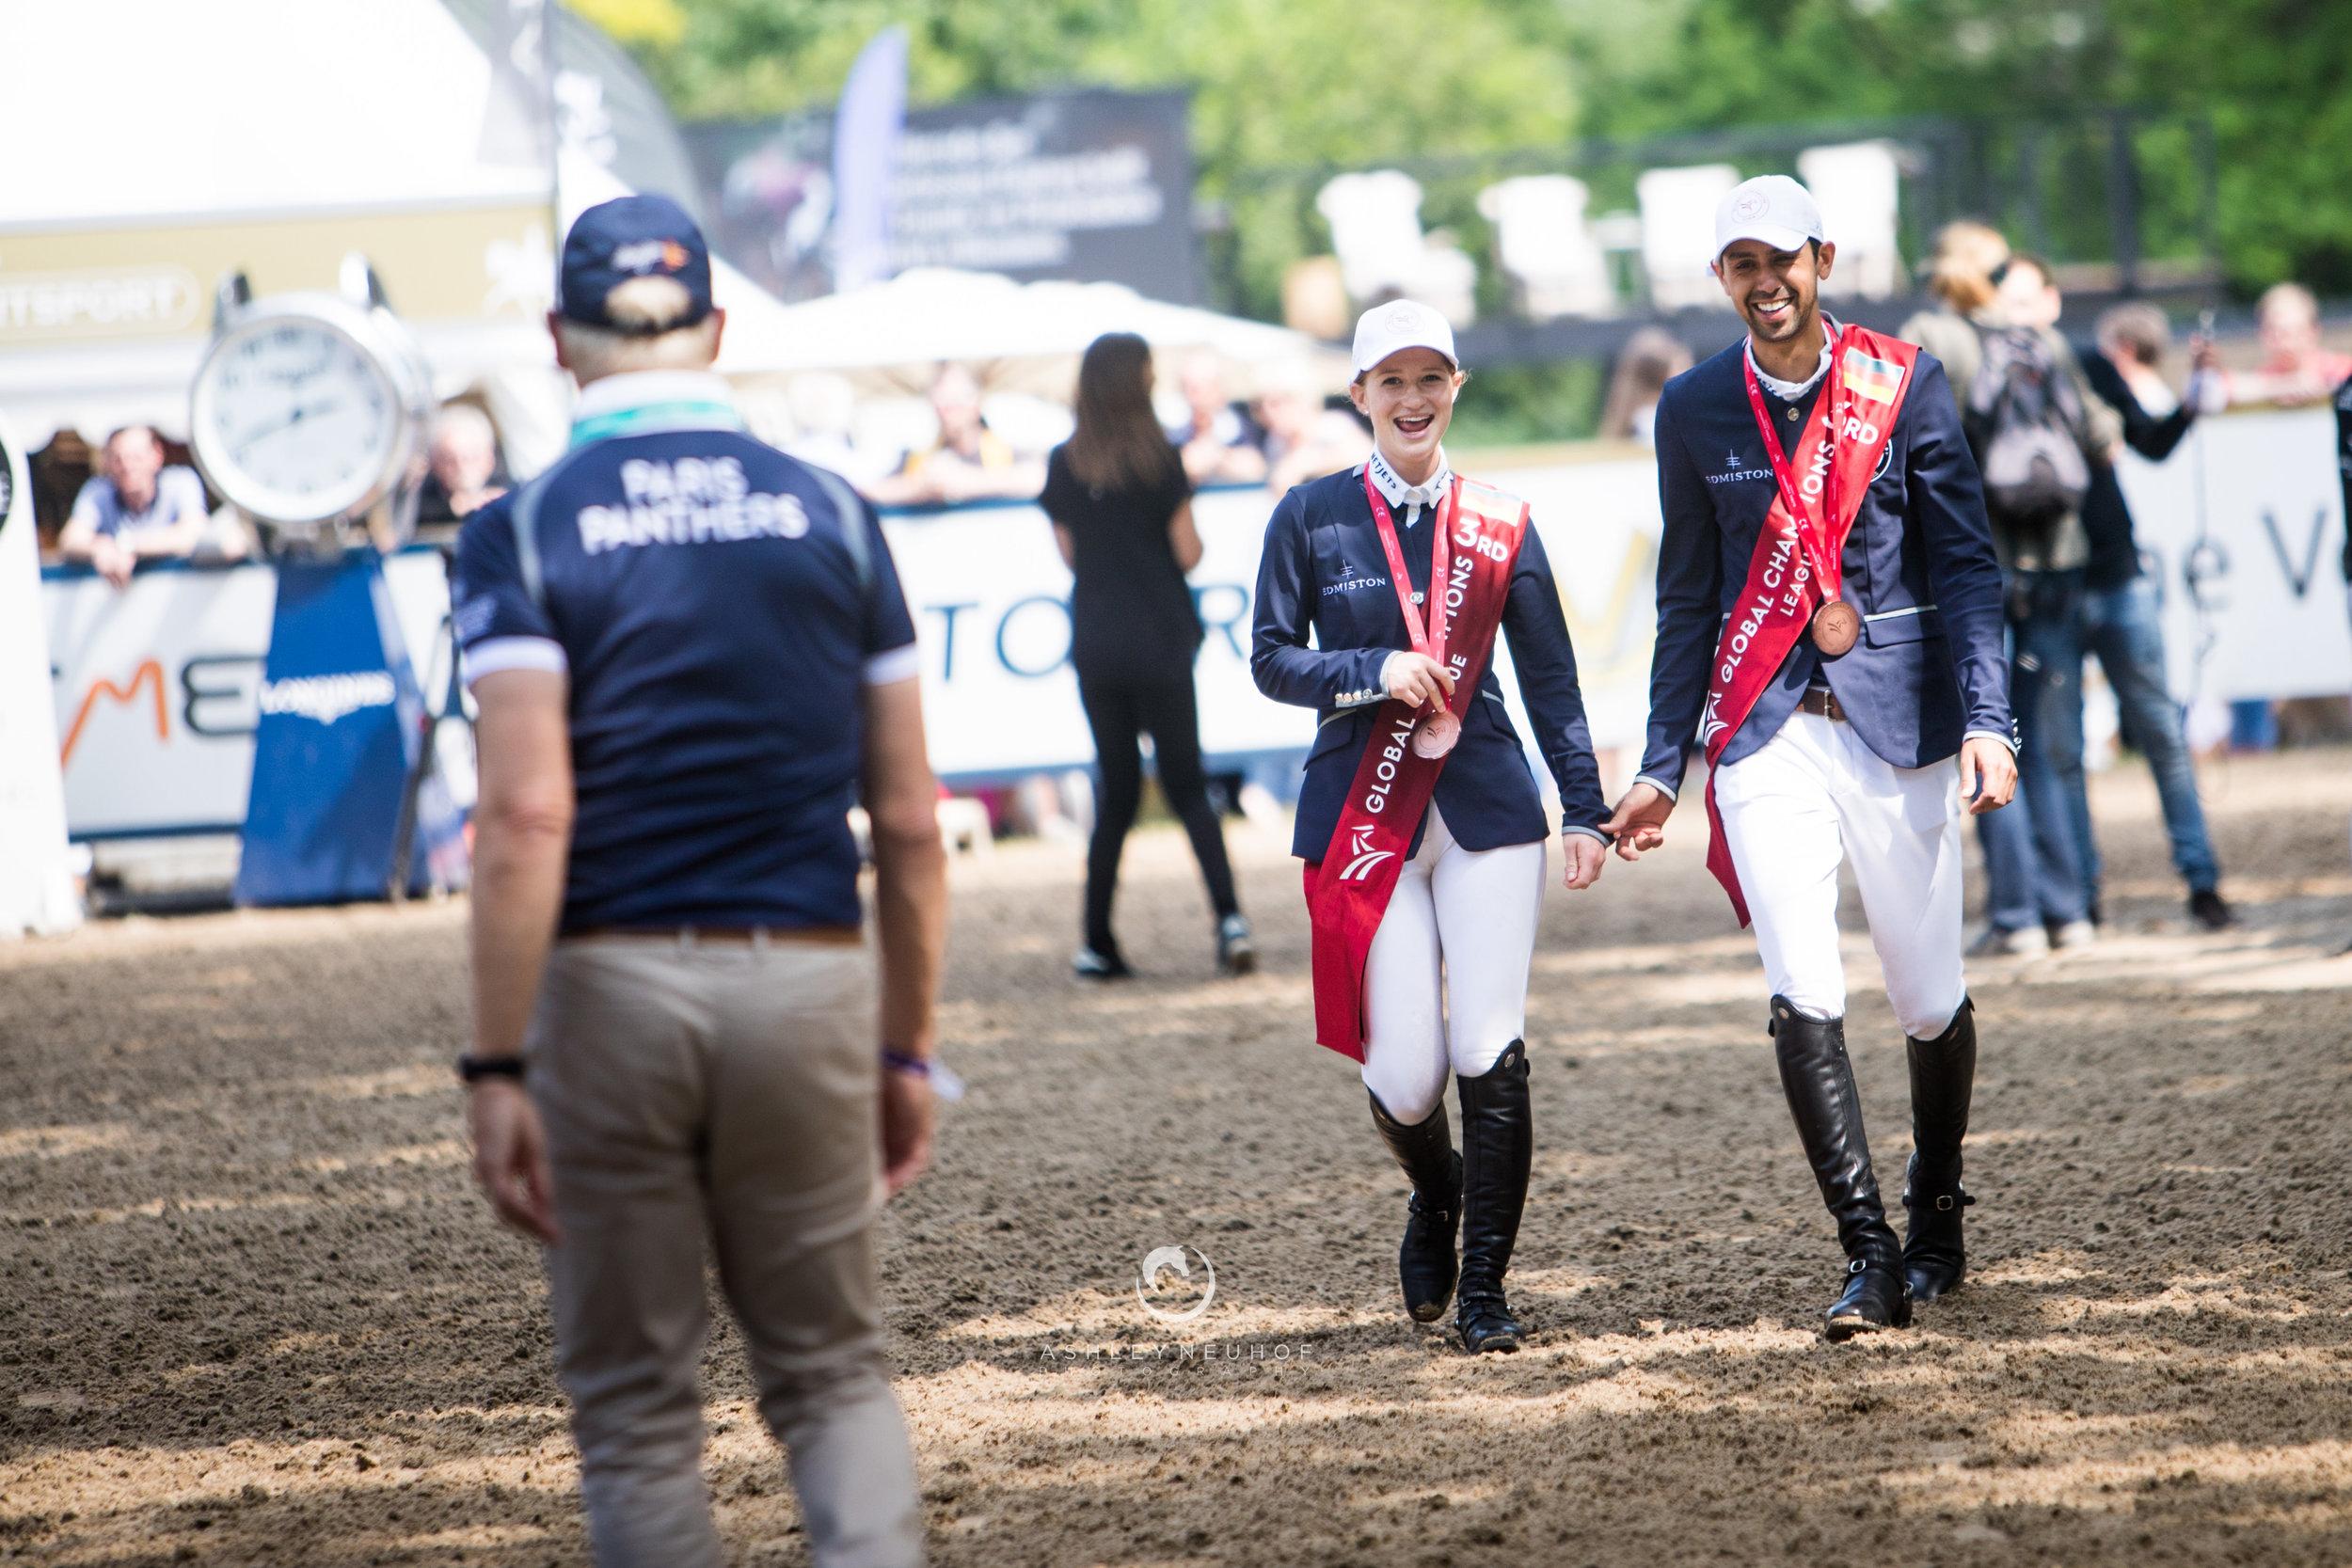 Jenn Gates and Nayel Nassar at Global Champions Tour of Hamburg 2019. Photo by Ashley Neuhof Photography.